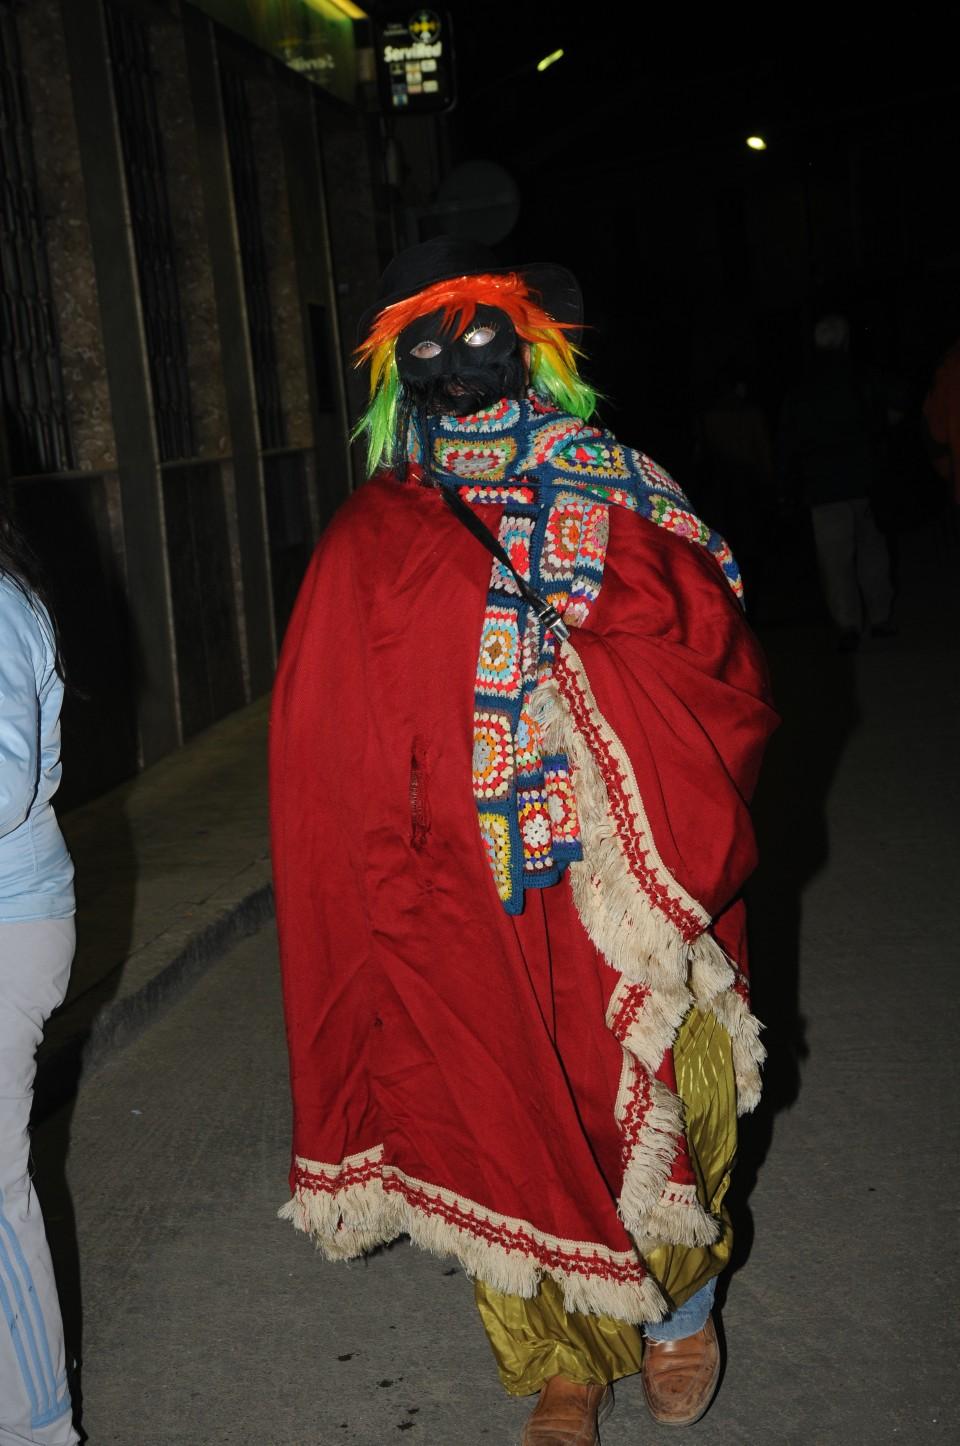 Noche mágica de San Antón